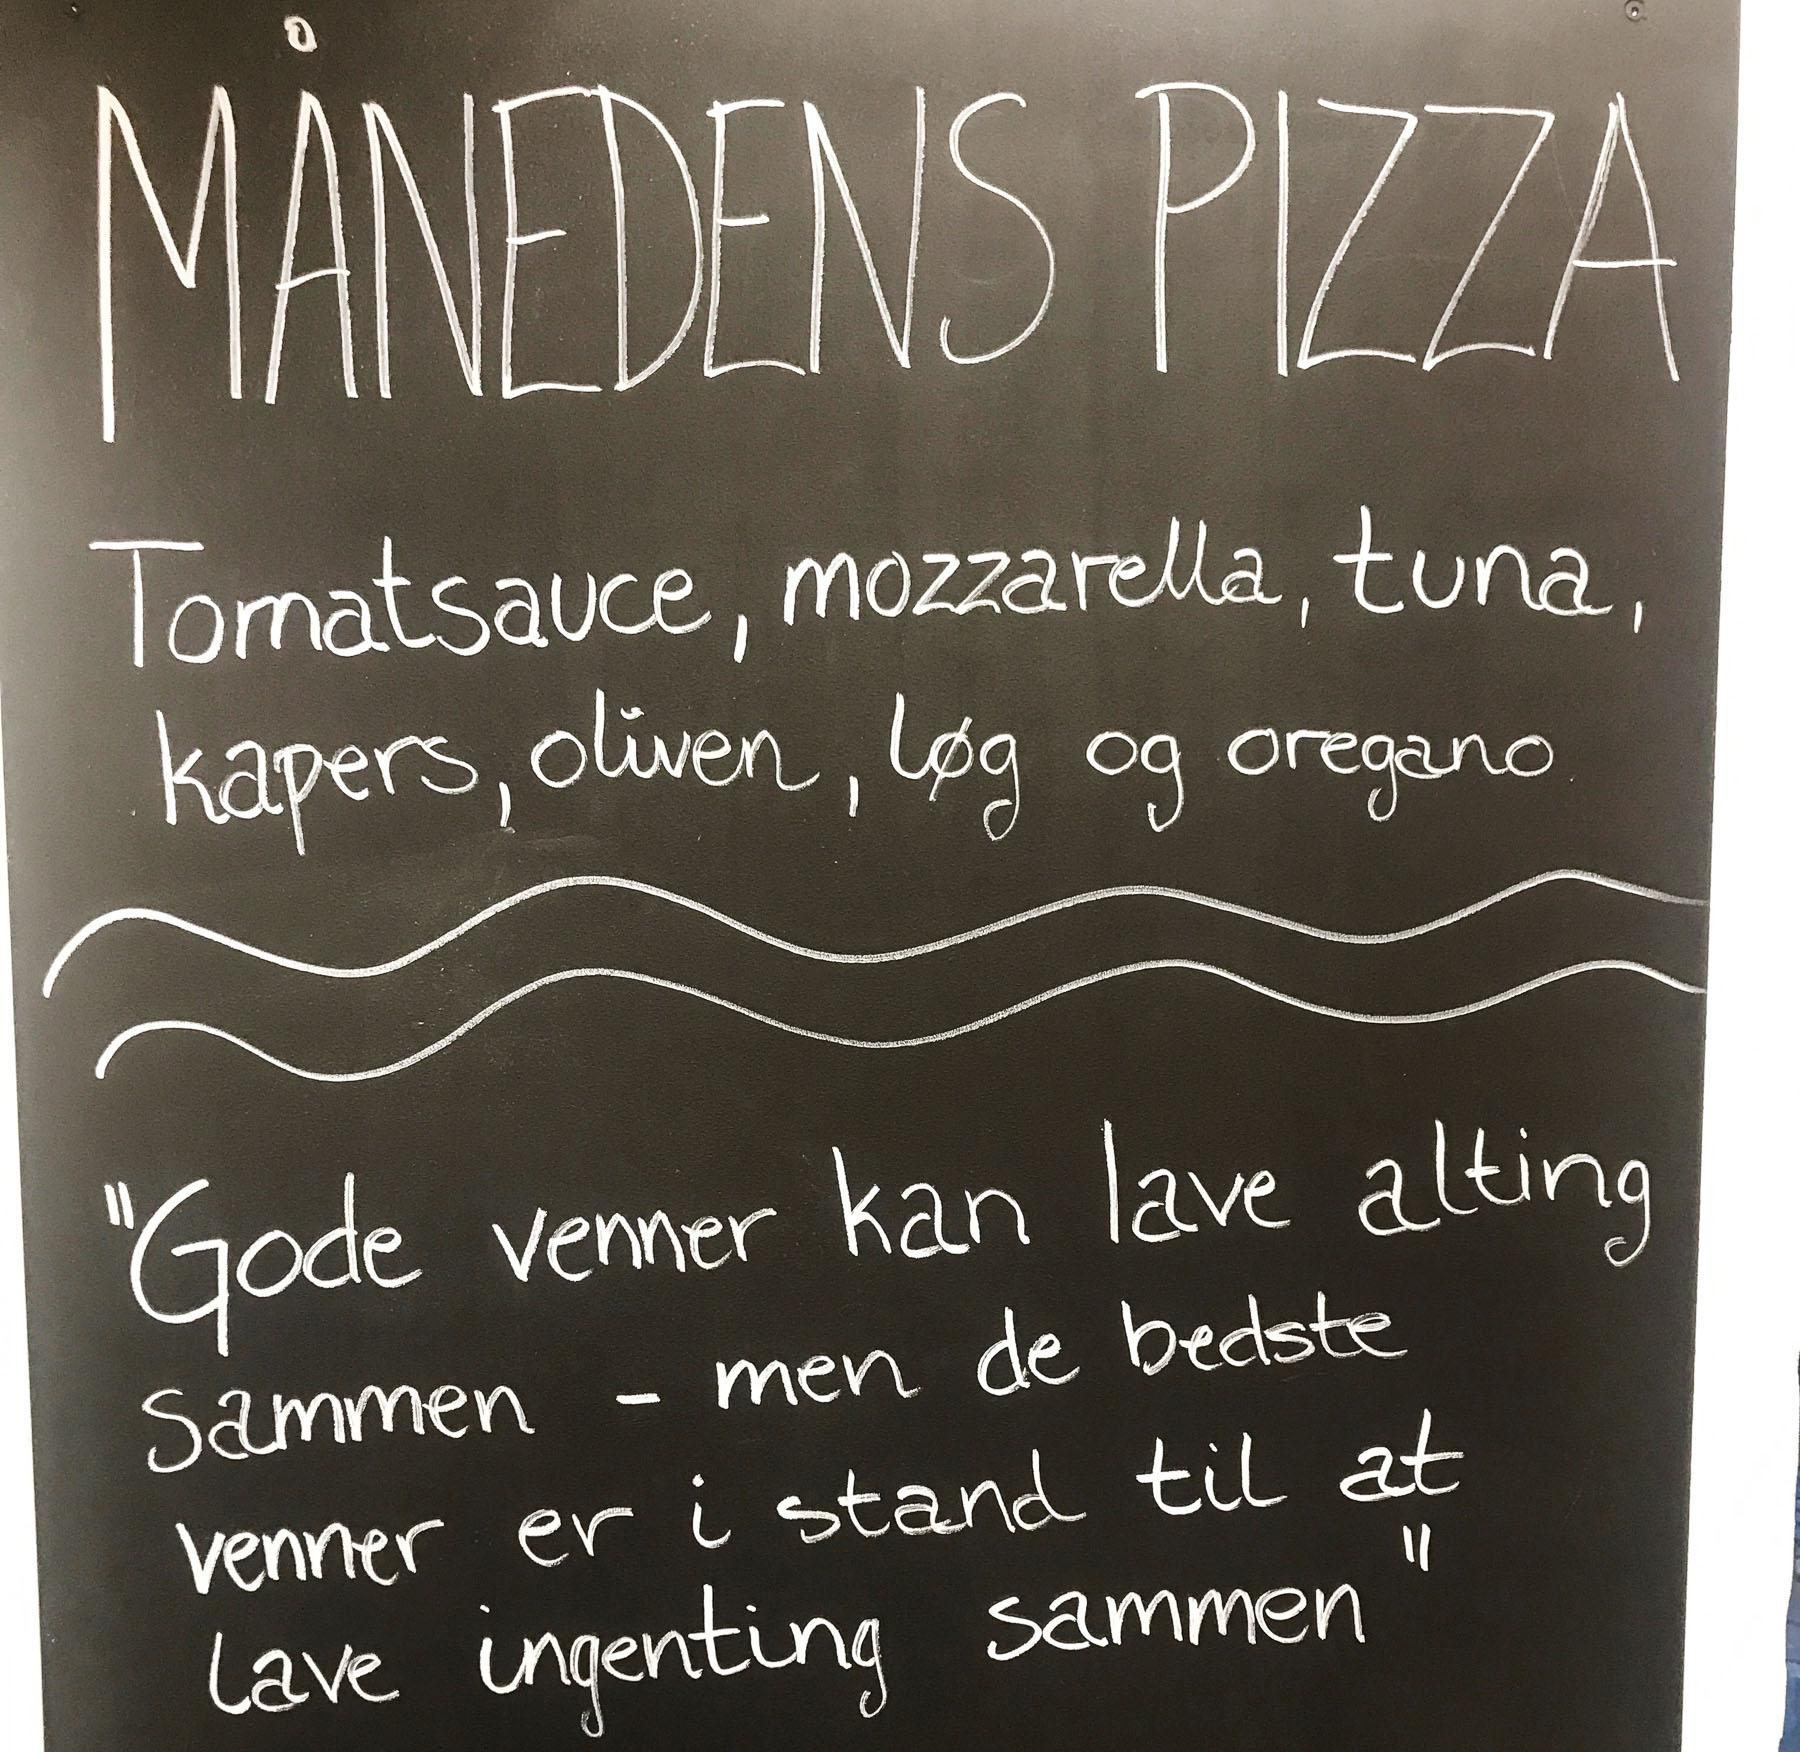 Italiensk pizzajoint: Ny pizza og gratis levering i hele januar måned